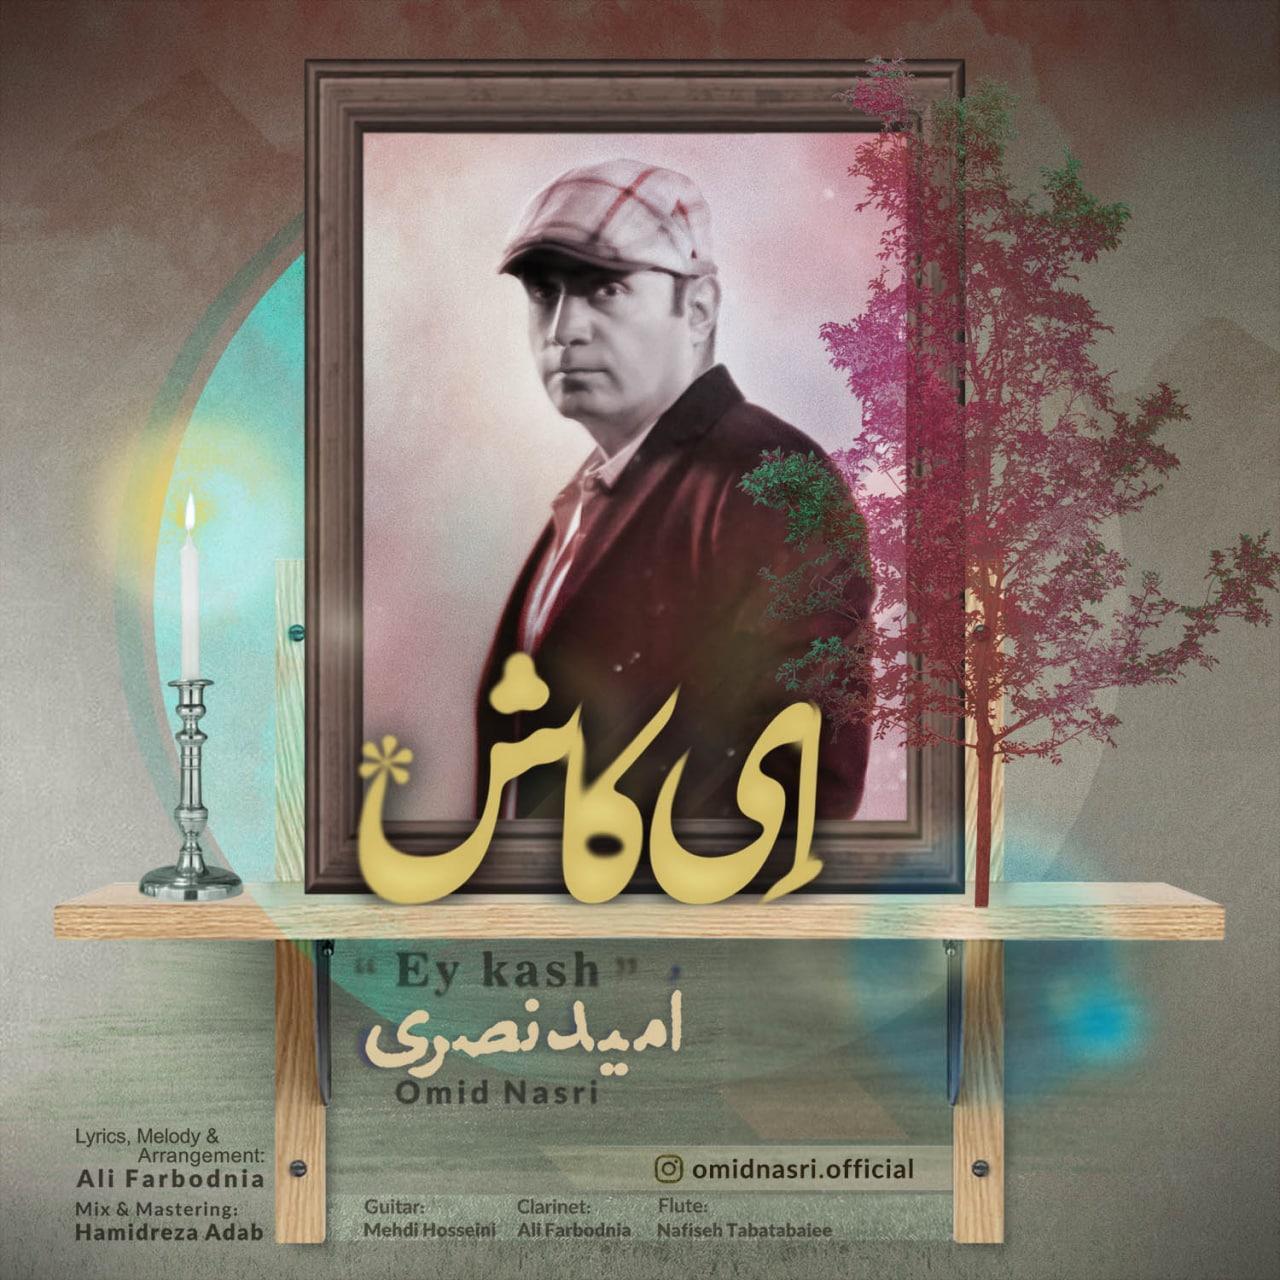 Omid Nasri-Ey Kash